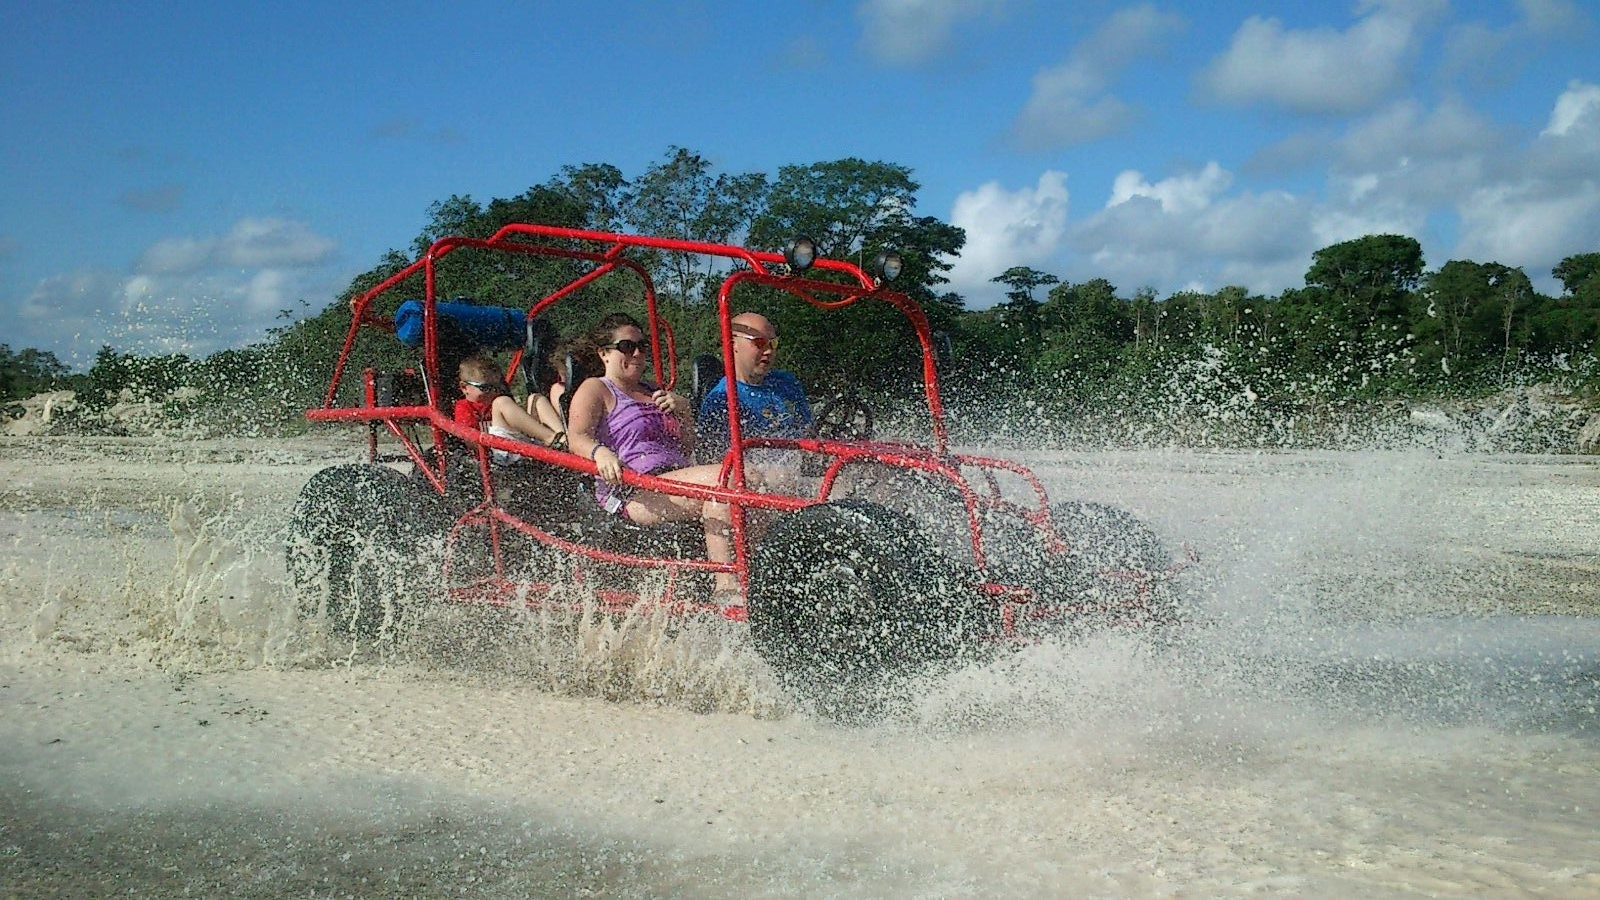 Dune-buggy-cozumel-punta-sur-tour-17